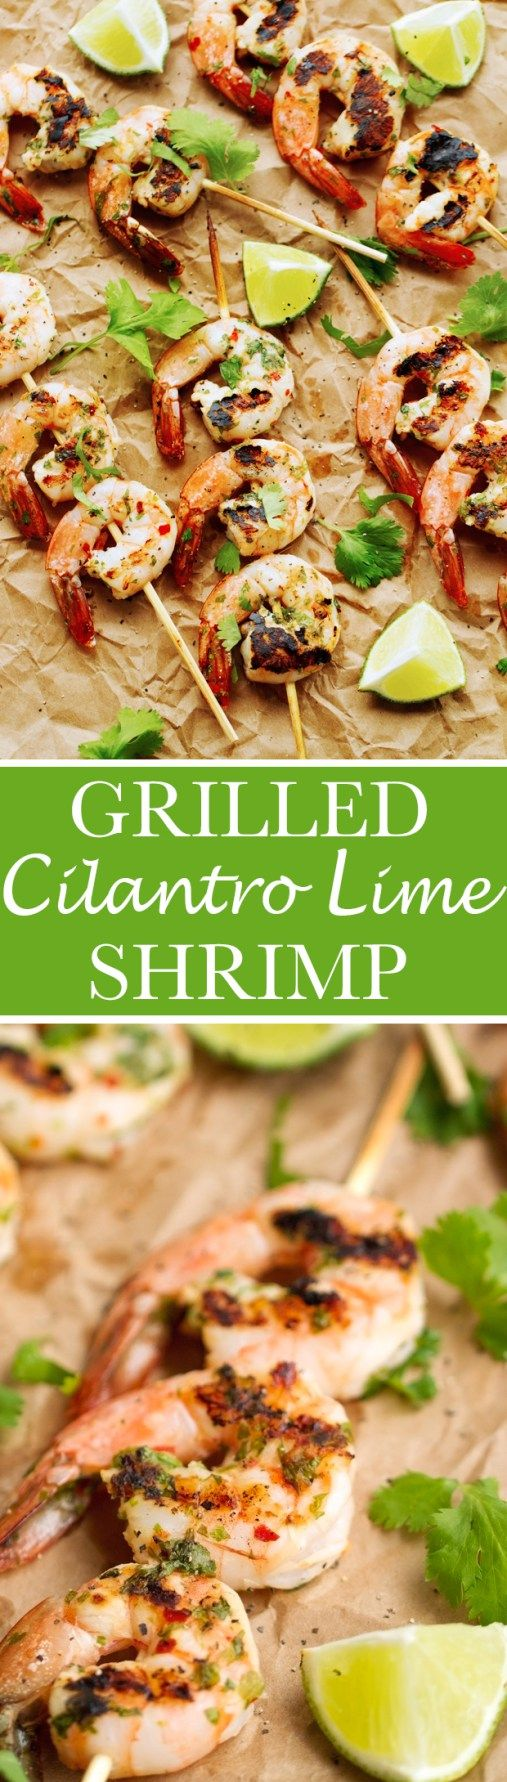 Grilled Cilantro + Lime Shrimp Skewers that are perfect for grilling this summer! Easy to make and less than 10 ingredients! #shrimpkabobs #shrimpskewers #grilledshrimp | Littlespicejar.com